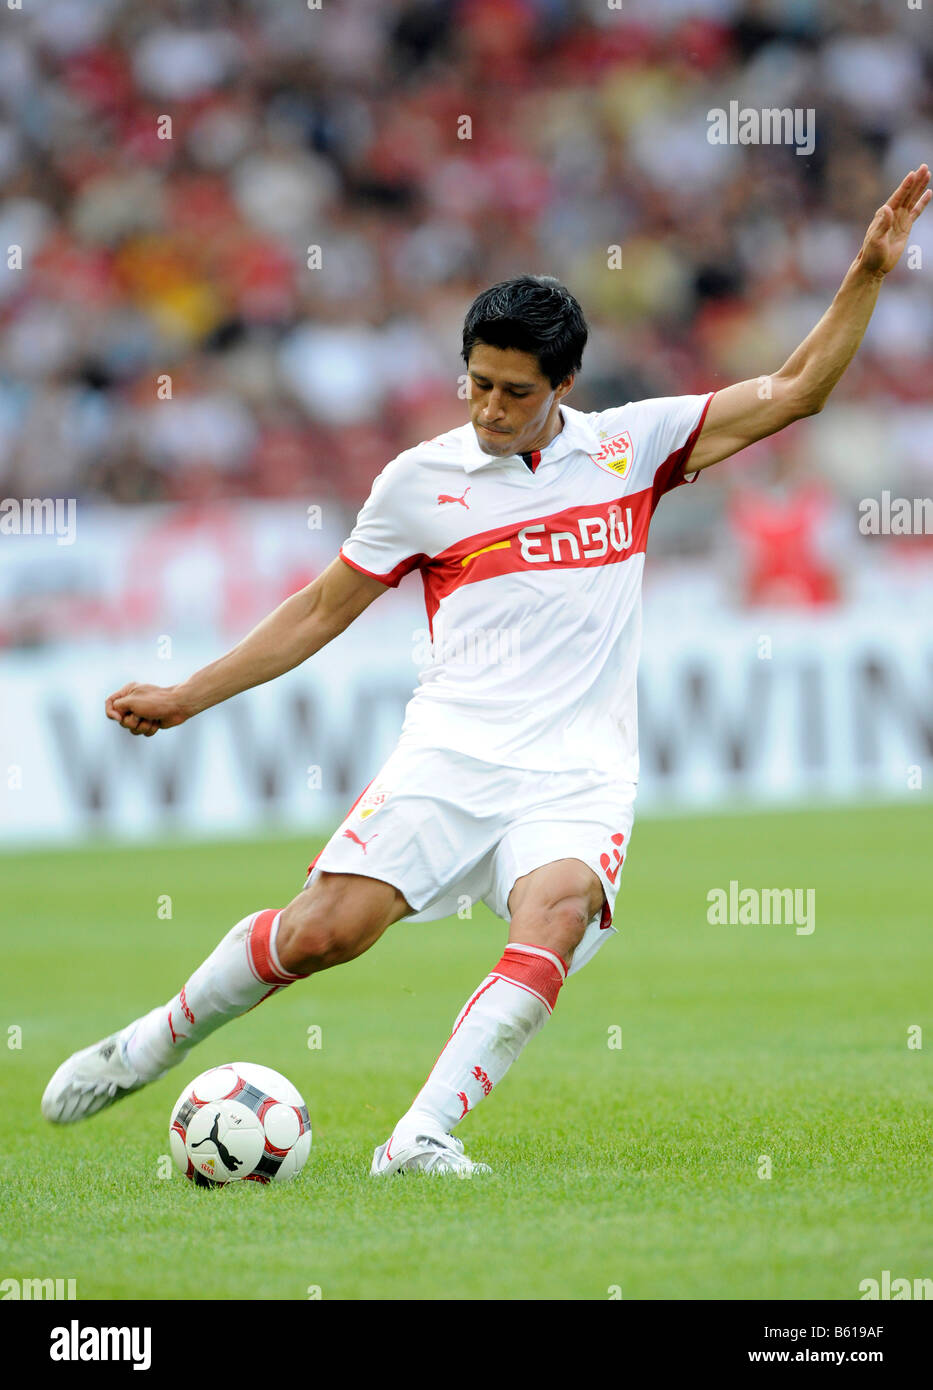 Ricardo Osorio, football player of VfB Stuttgart, shooting - Stock Image